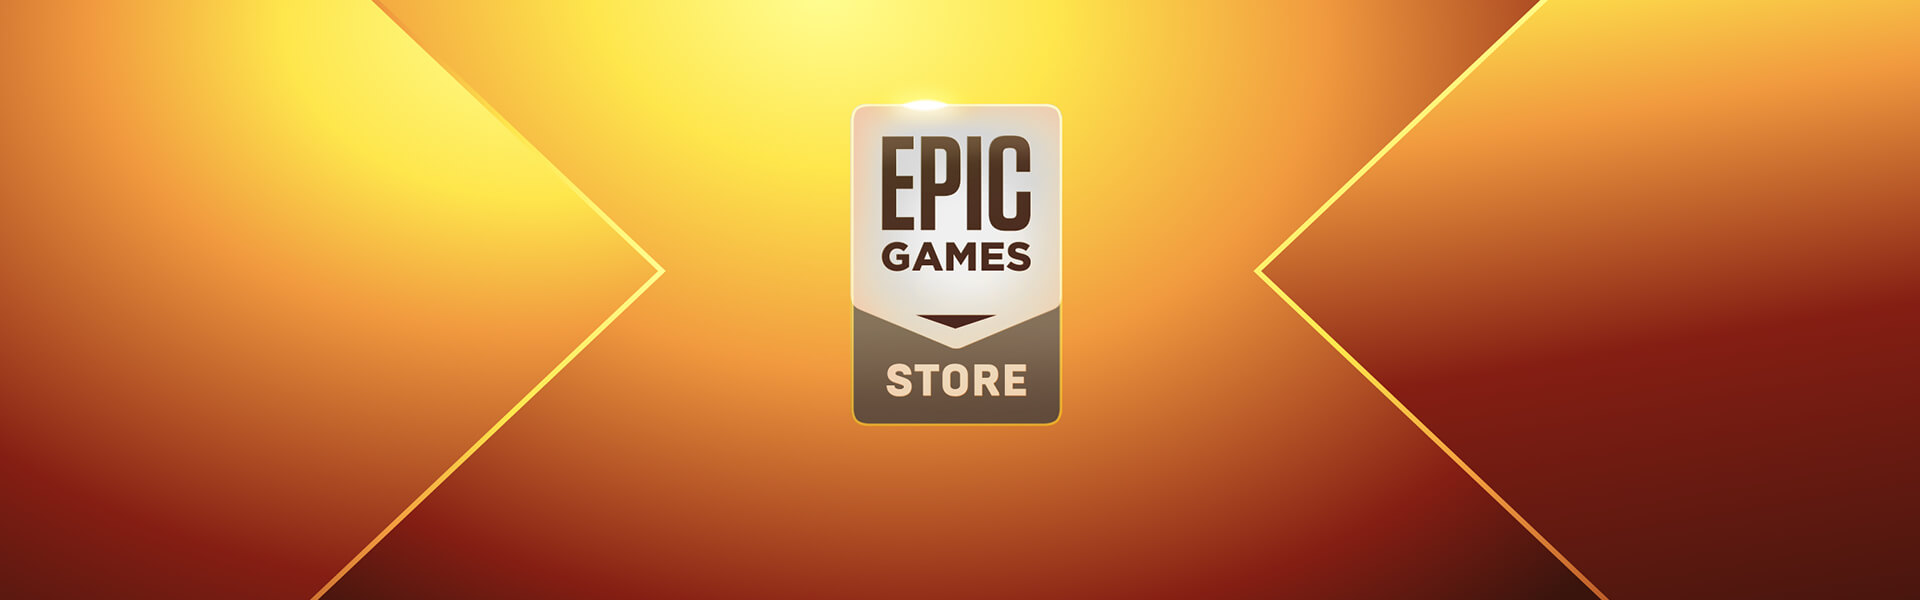 Sonic Mania بازی رایگان بعدی فروشگاه اپیک گیمز است